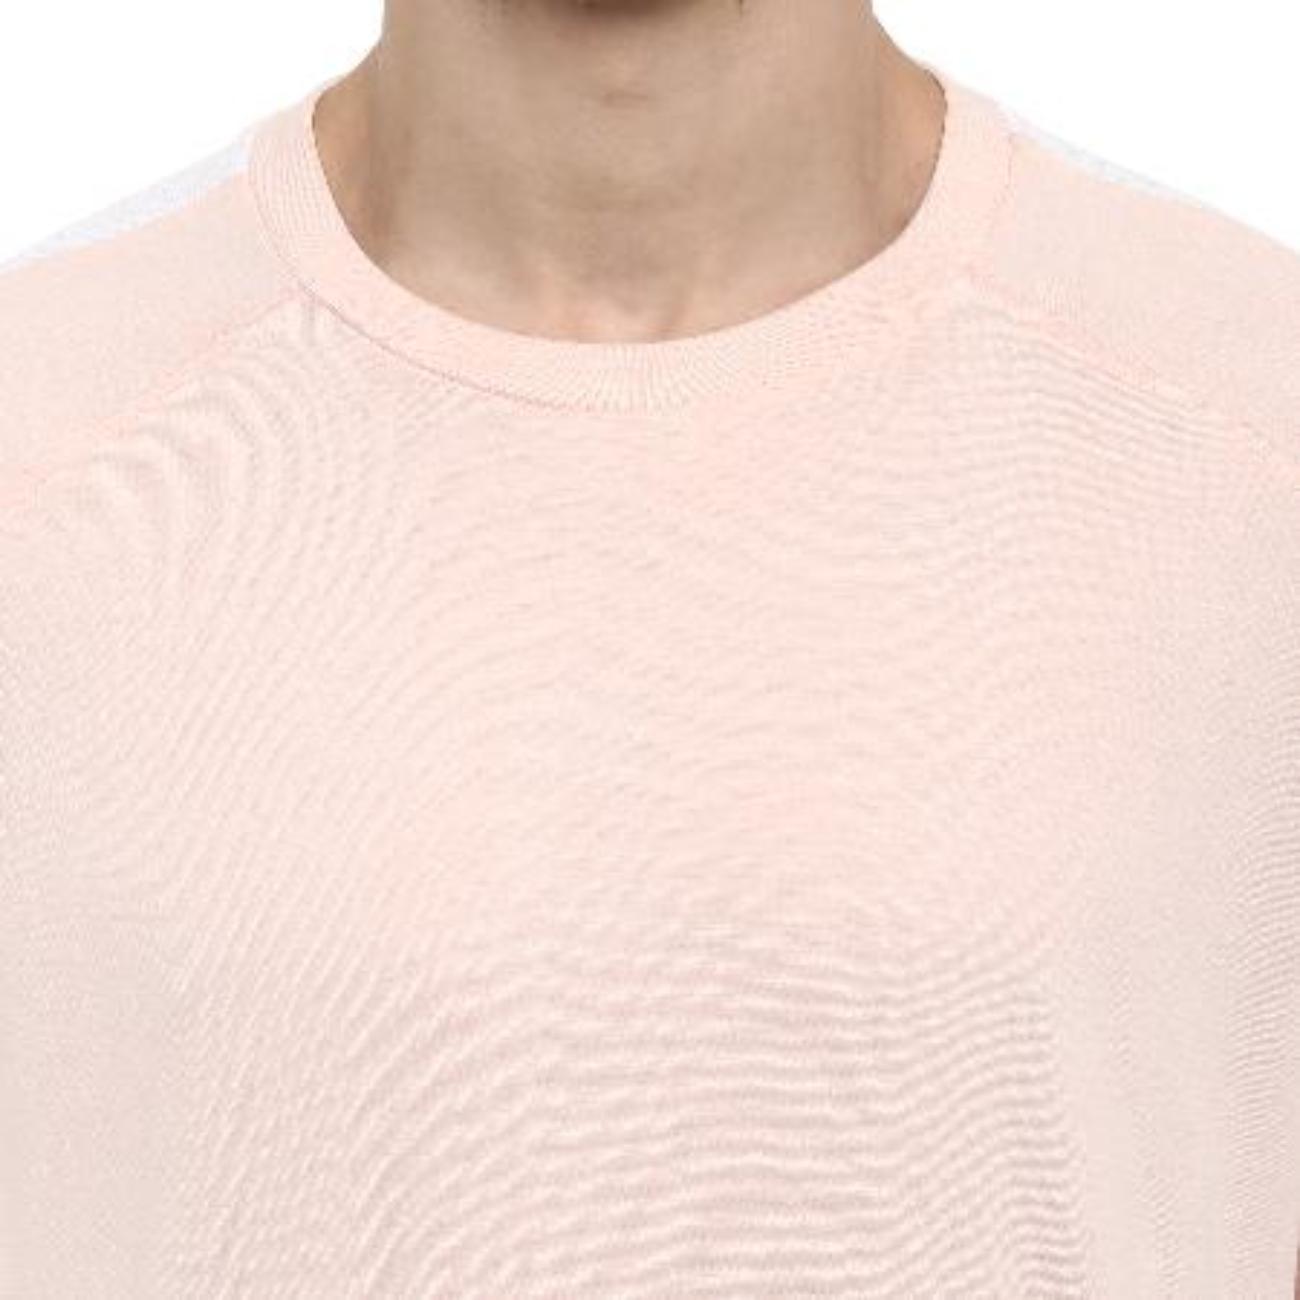 Comfortable Half Sleeves Tshirt